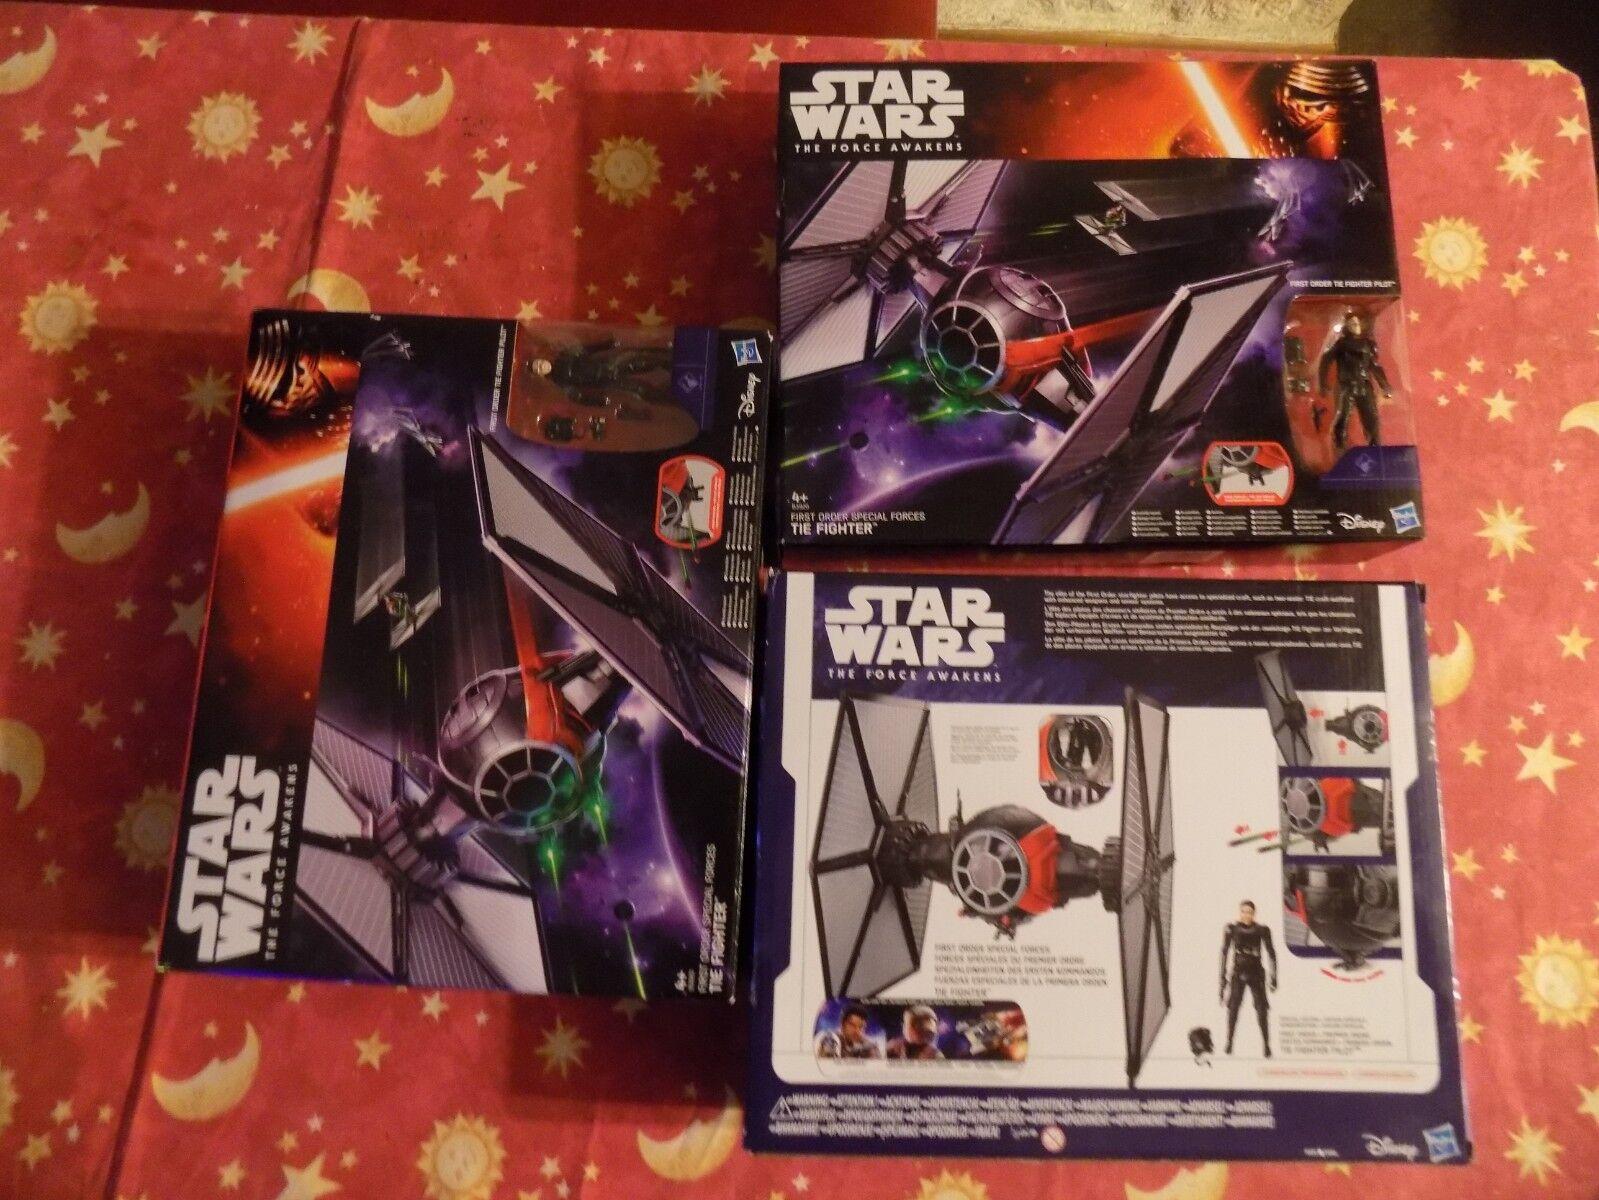 Star Wars Cadeau Noel NEUF Soldé Moitié Moitié Moitié Prix TIE FIGHTER + PILOTE star wars NEUF ab239a